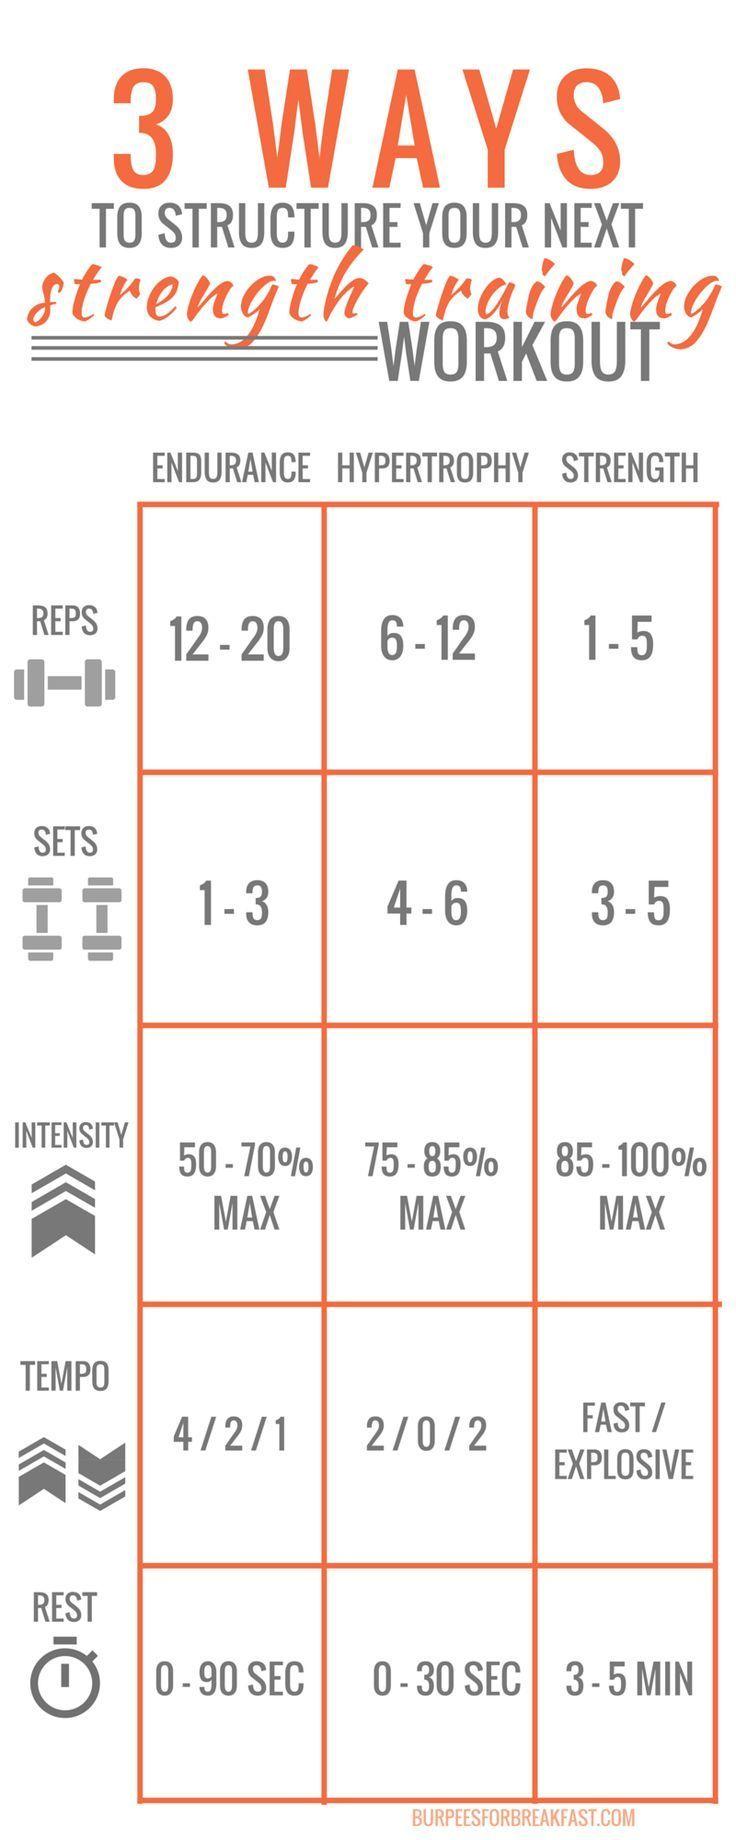 Max Lifting Rep Weight Chart